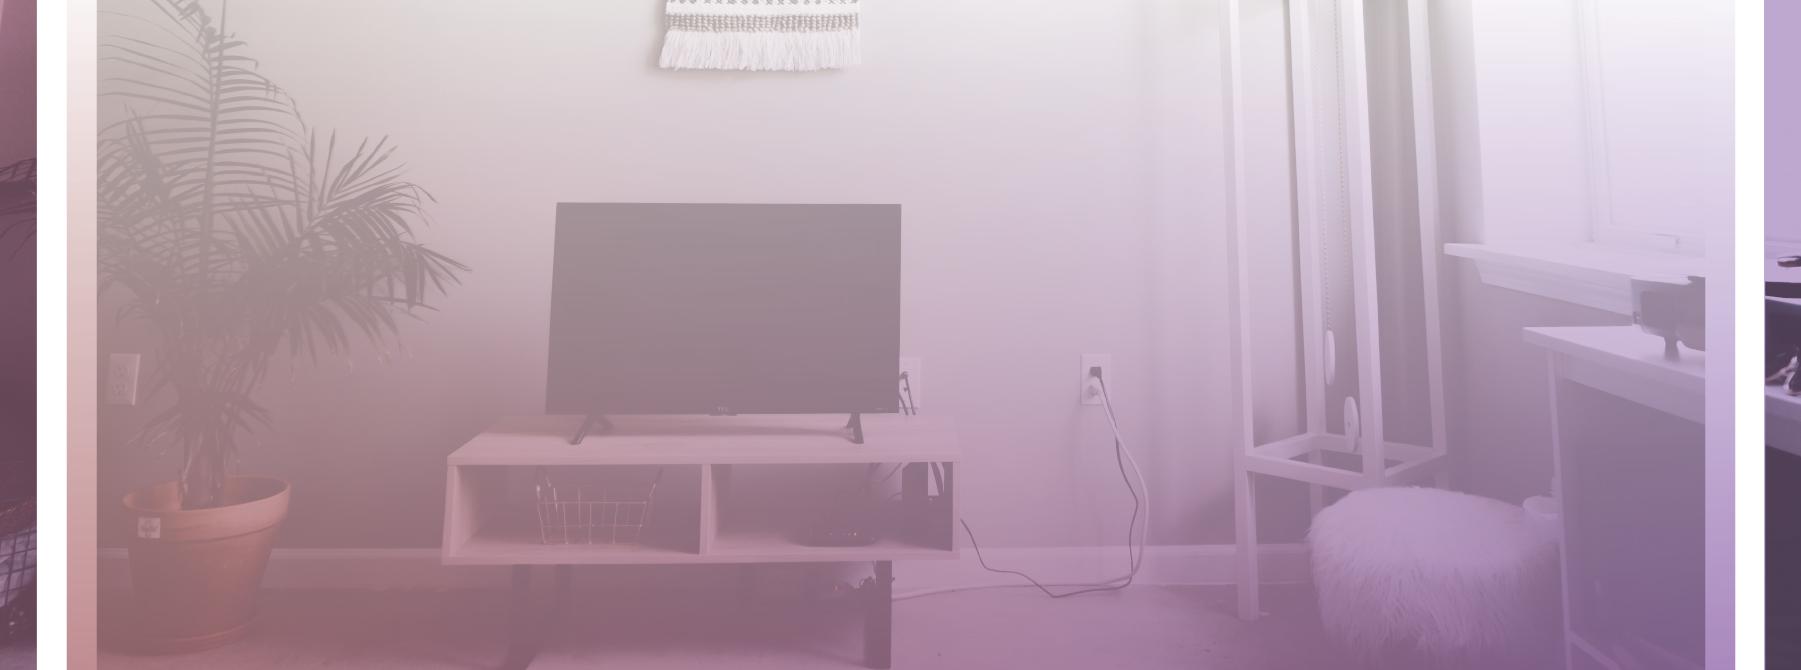 EvenVision Blog Post - Arcata Example